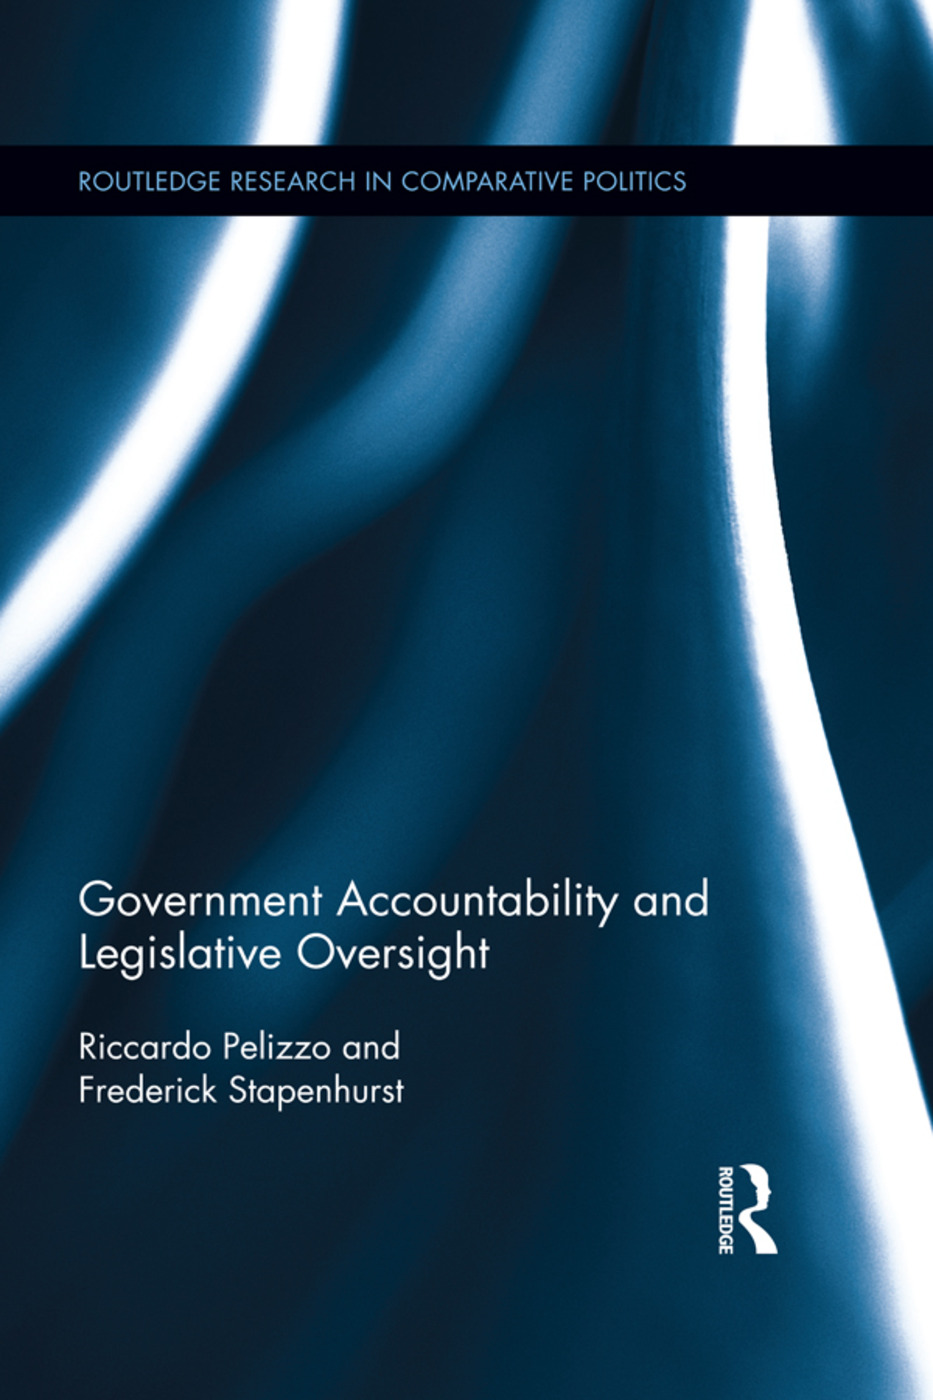 Government Accountability and Legislative Oversight book cover